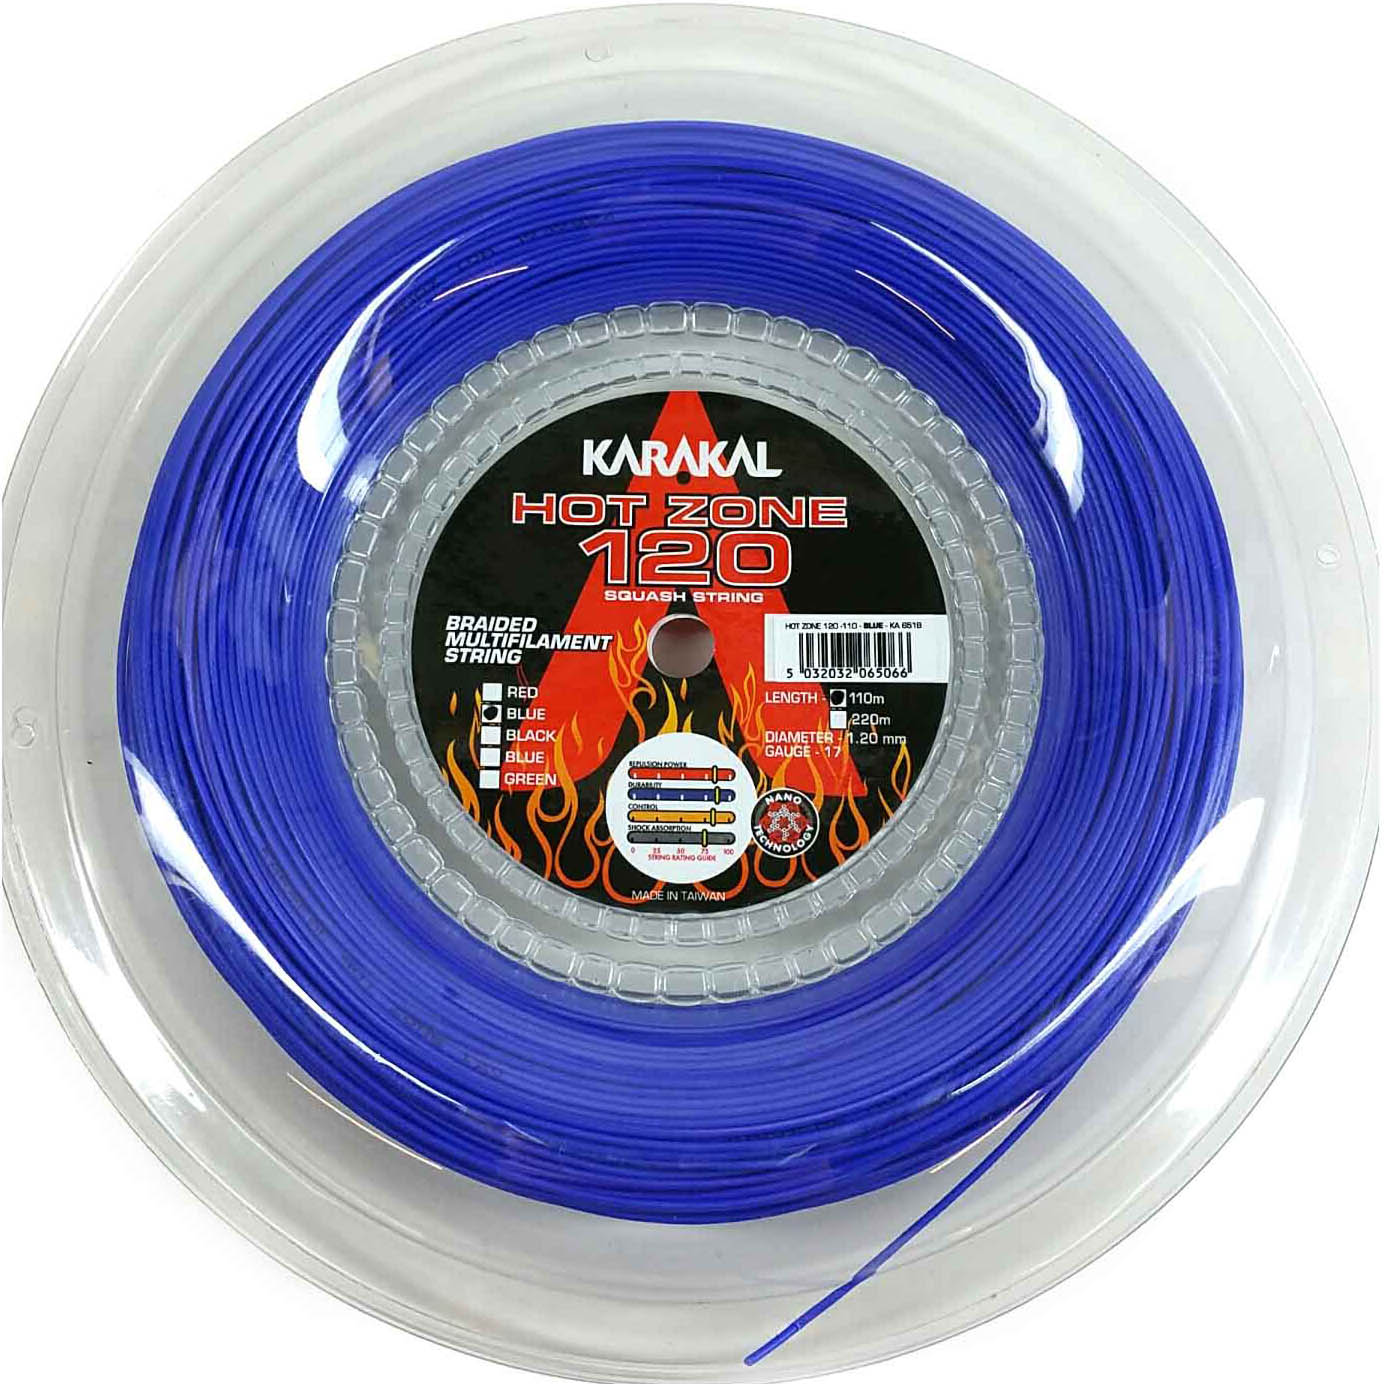 Karakal Hot Zone 120 Squash String - 110m Reel - Blue